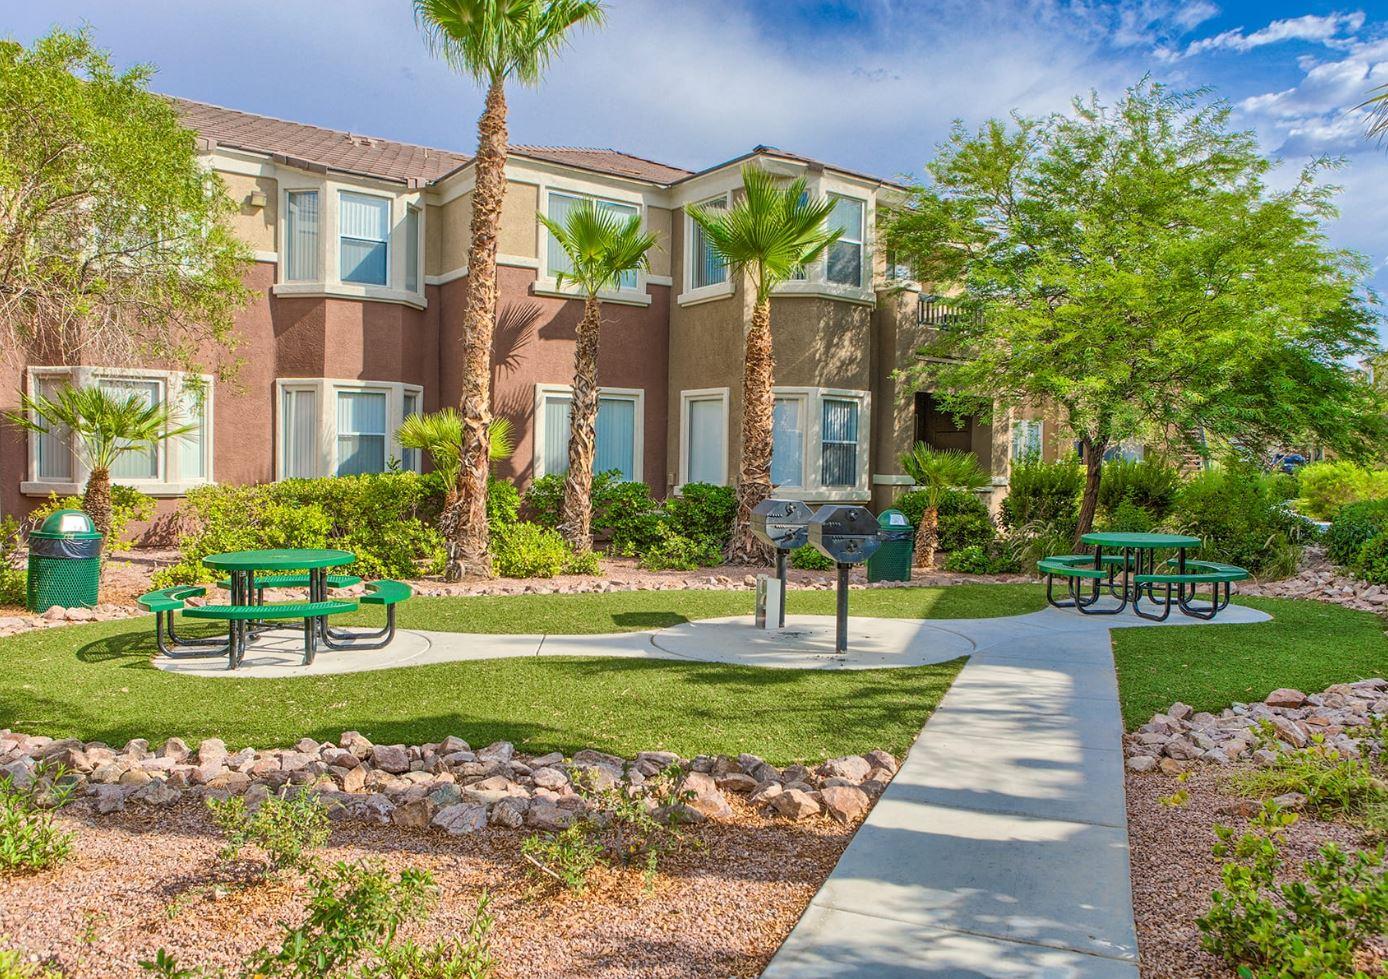 Positano Apartments $46,500,000 - 223(f) Las Vegas, NV 360 units July 2019